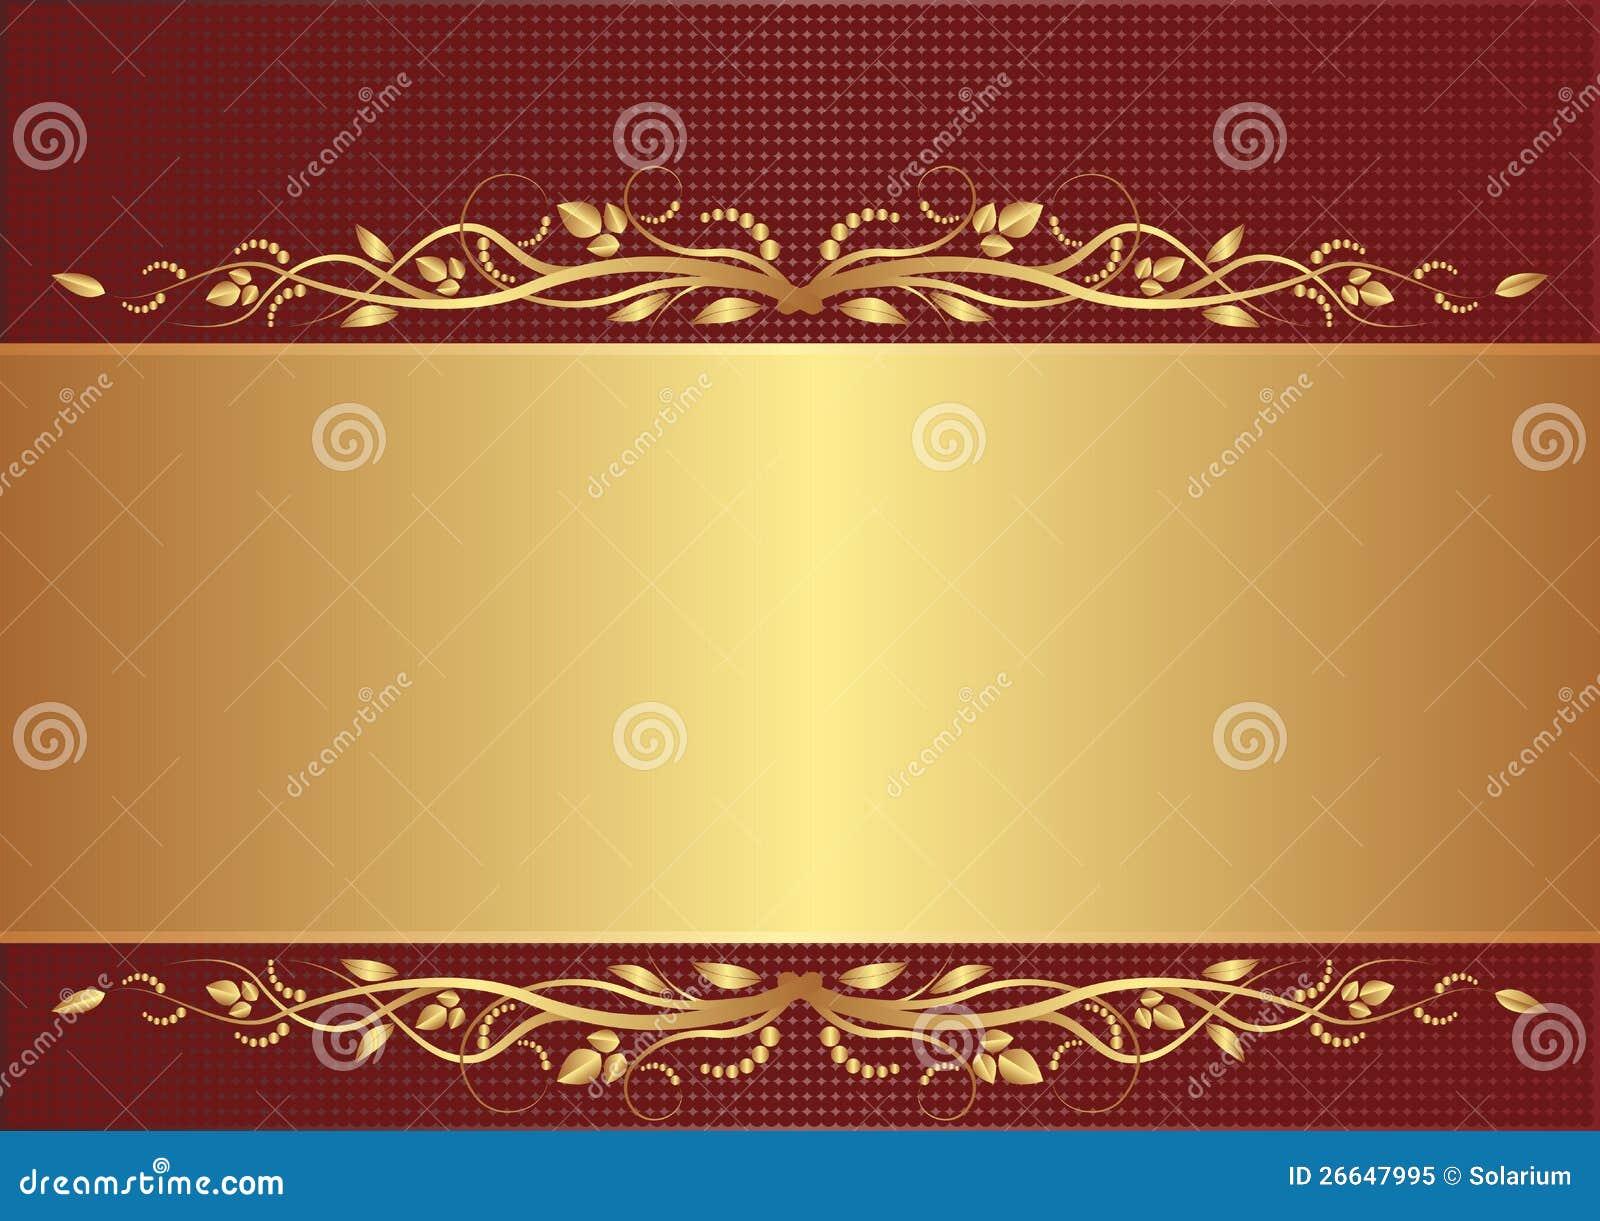 El Dorado Blue Card >> Burgundy And Gold Background Royalty Free Stock Photo - Image: 26647995